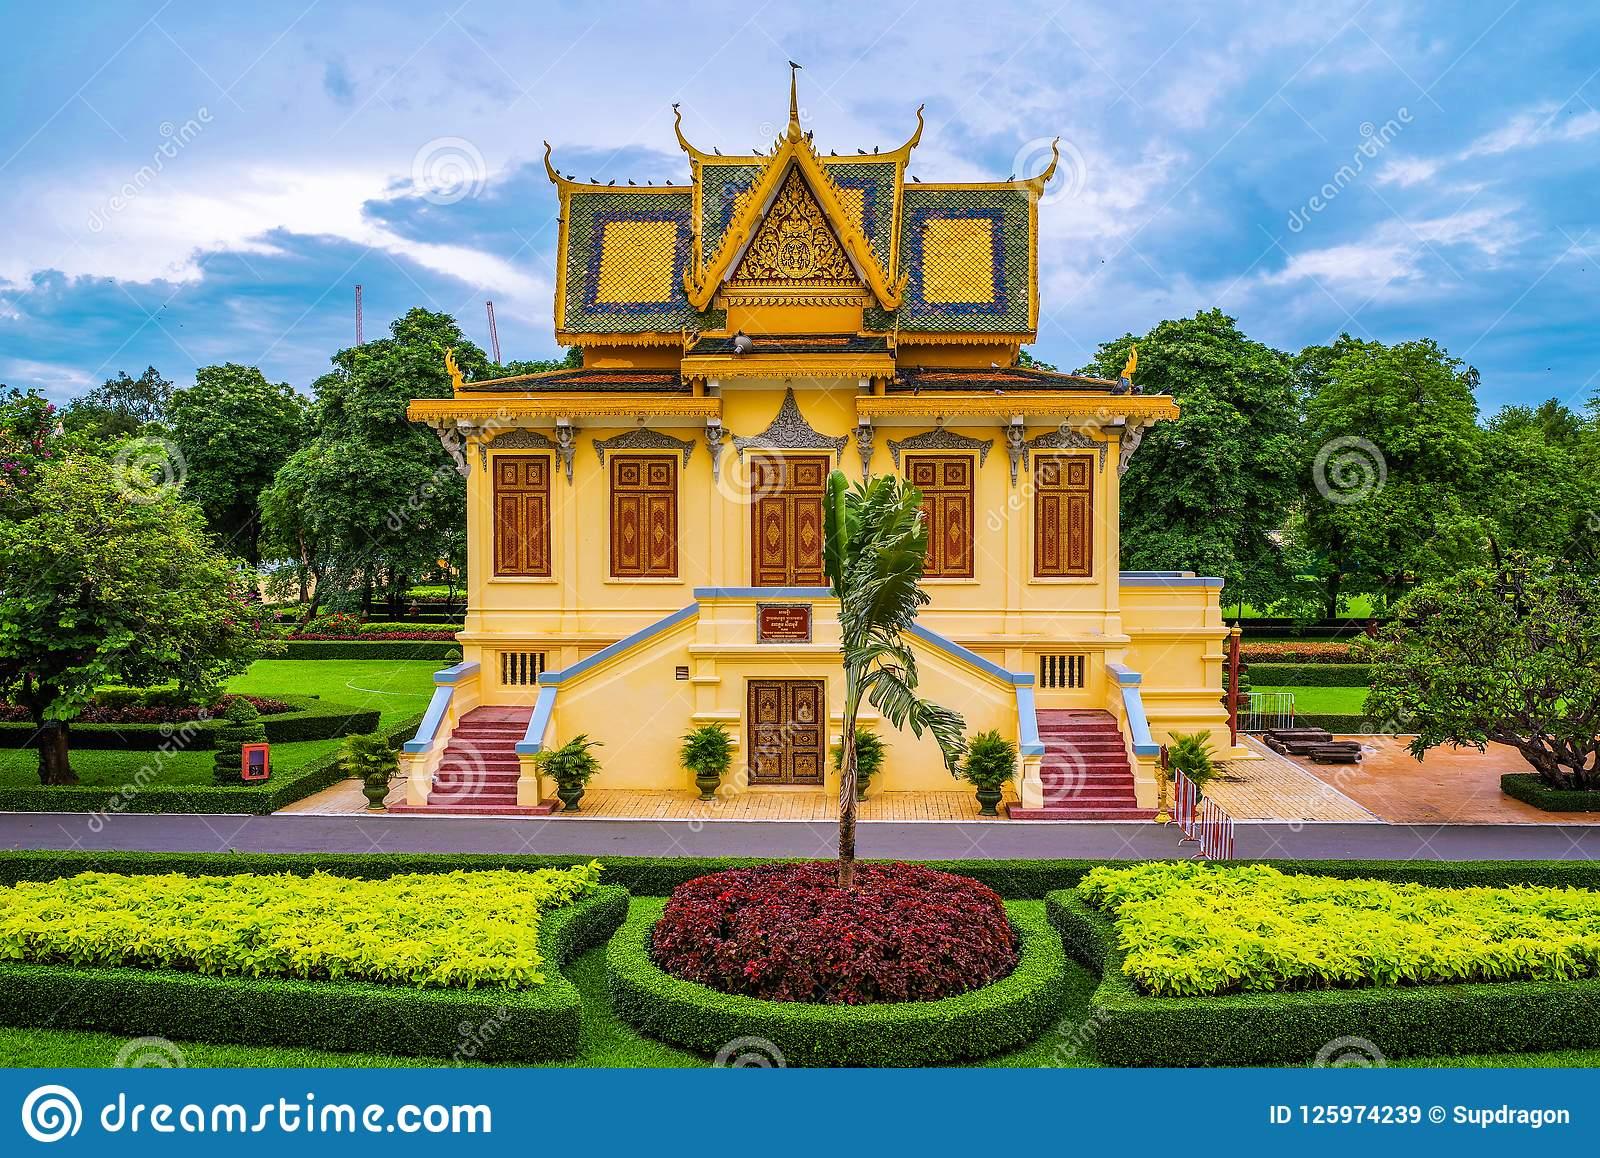 Asia Garten Ottobrunn Schön the Royal Palace In Phnom Penh Cambodia Stock Image Image